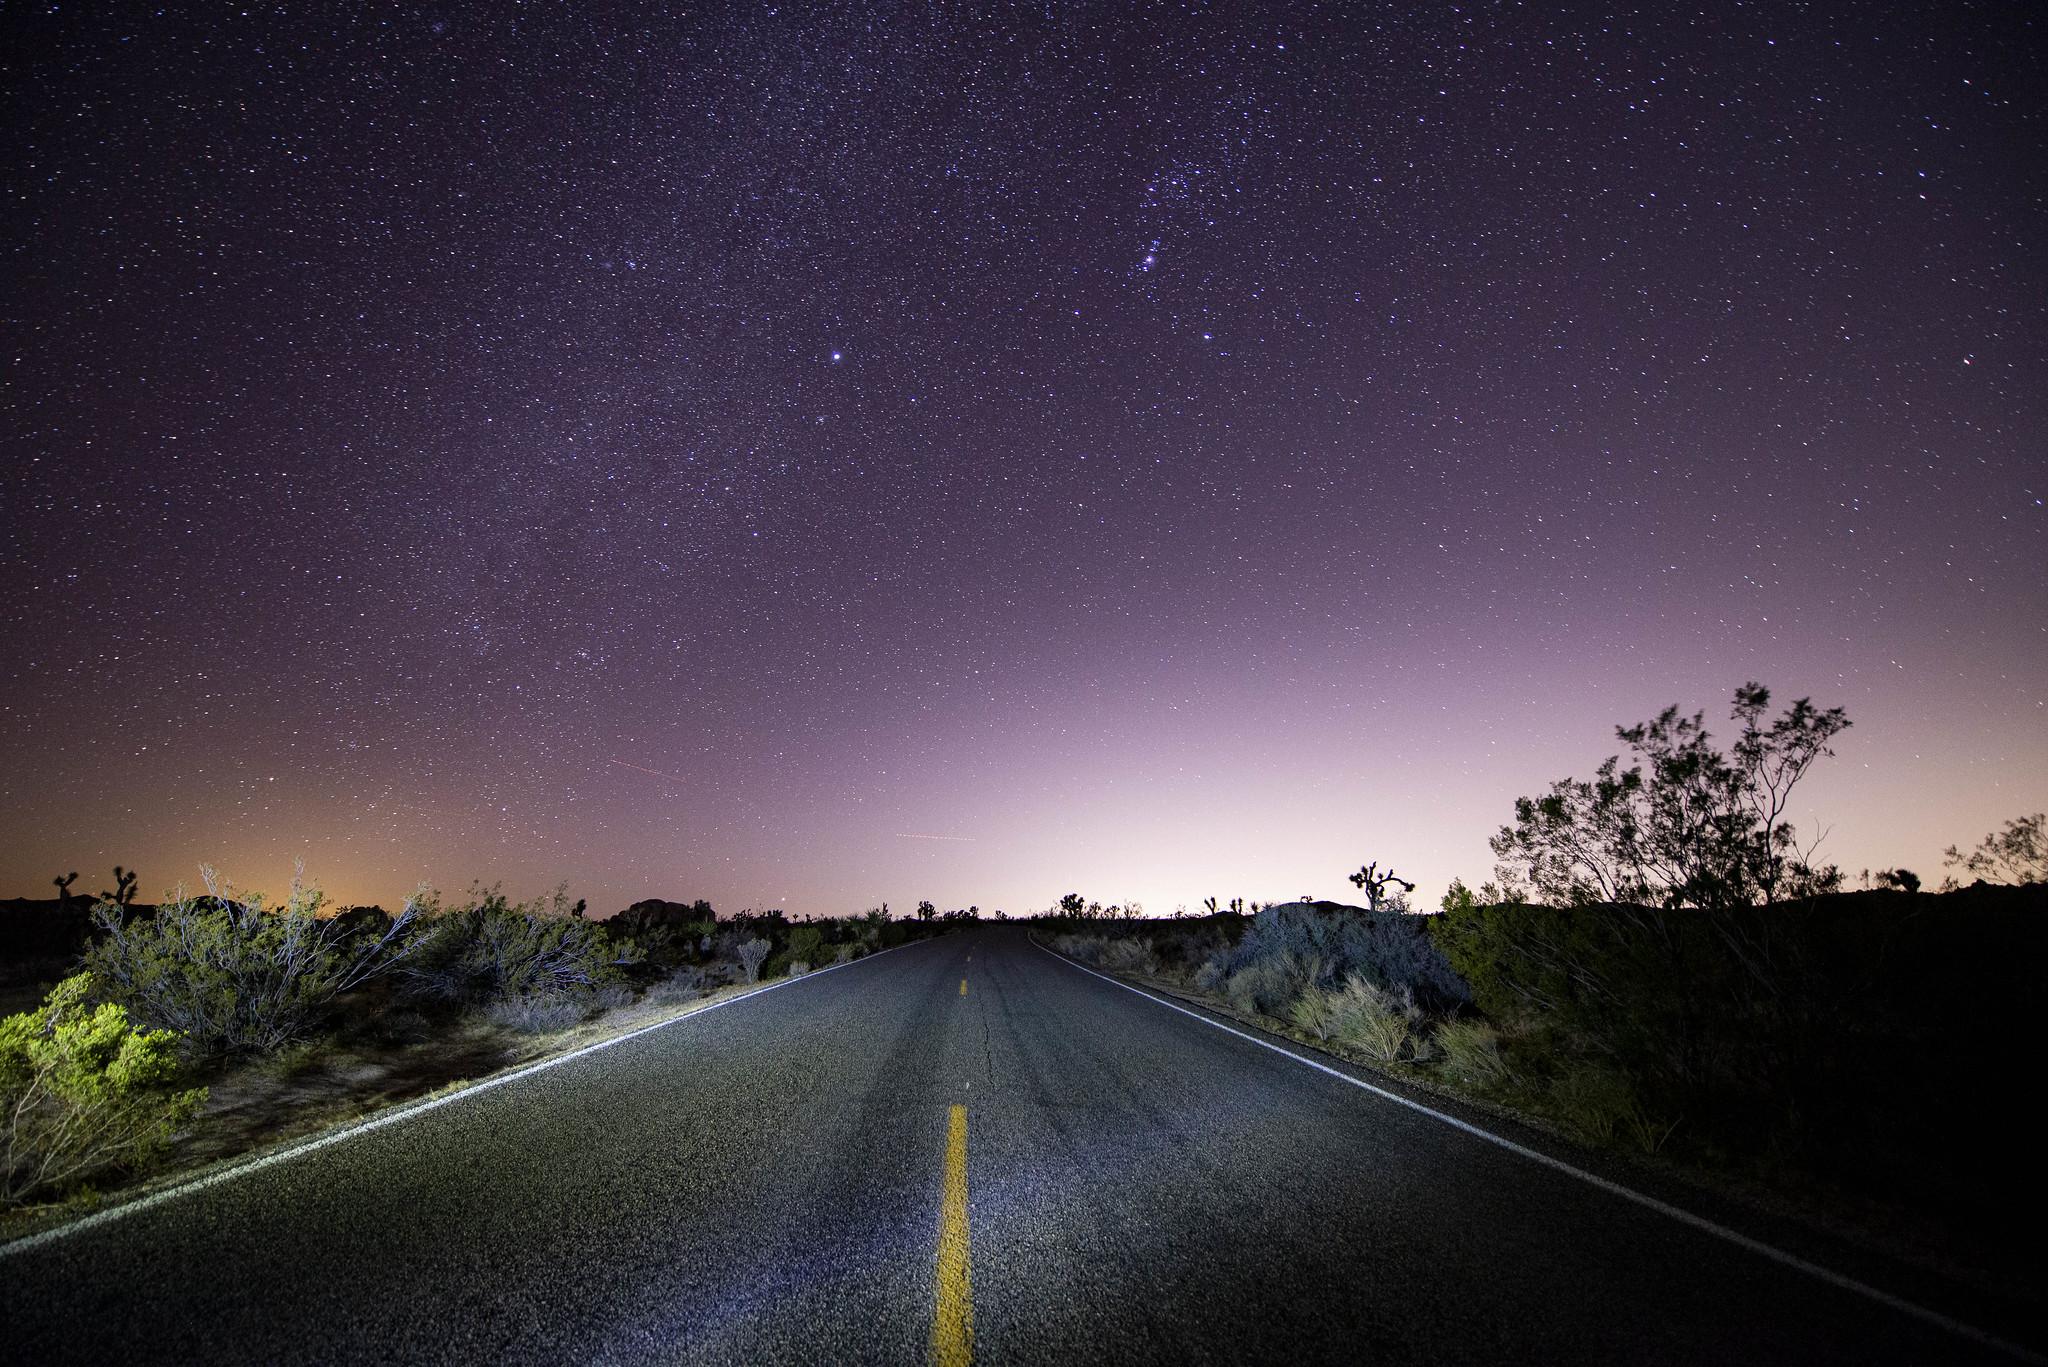 Joshua Tree - Night Road